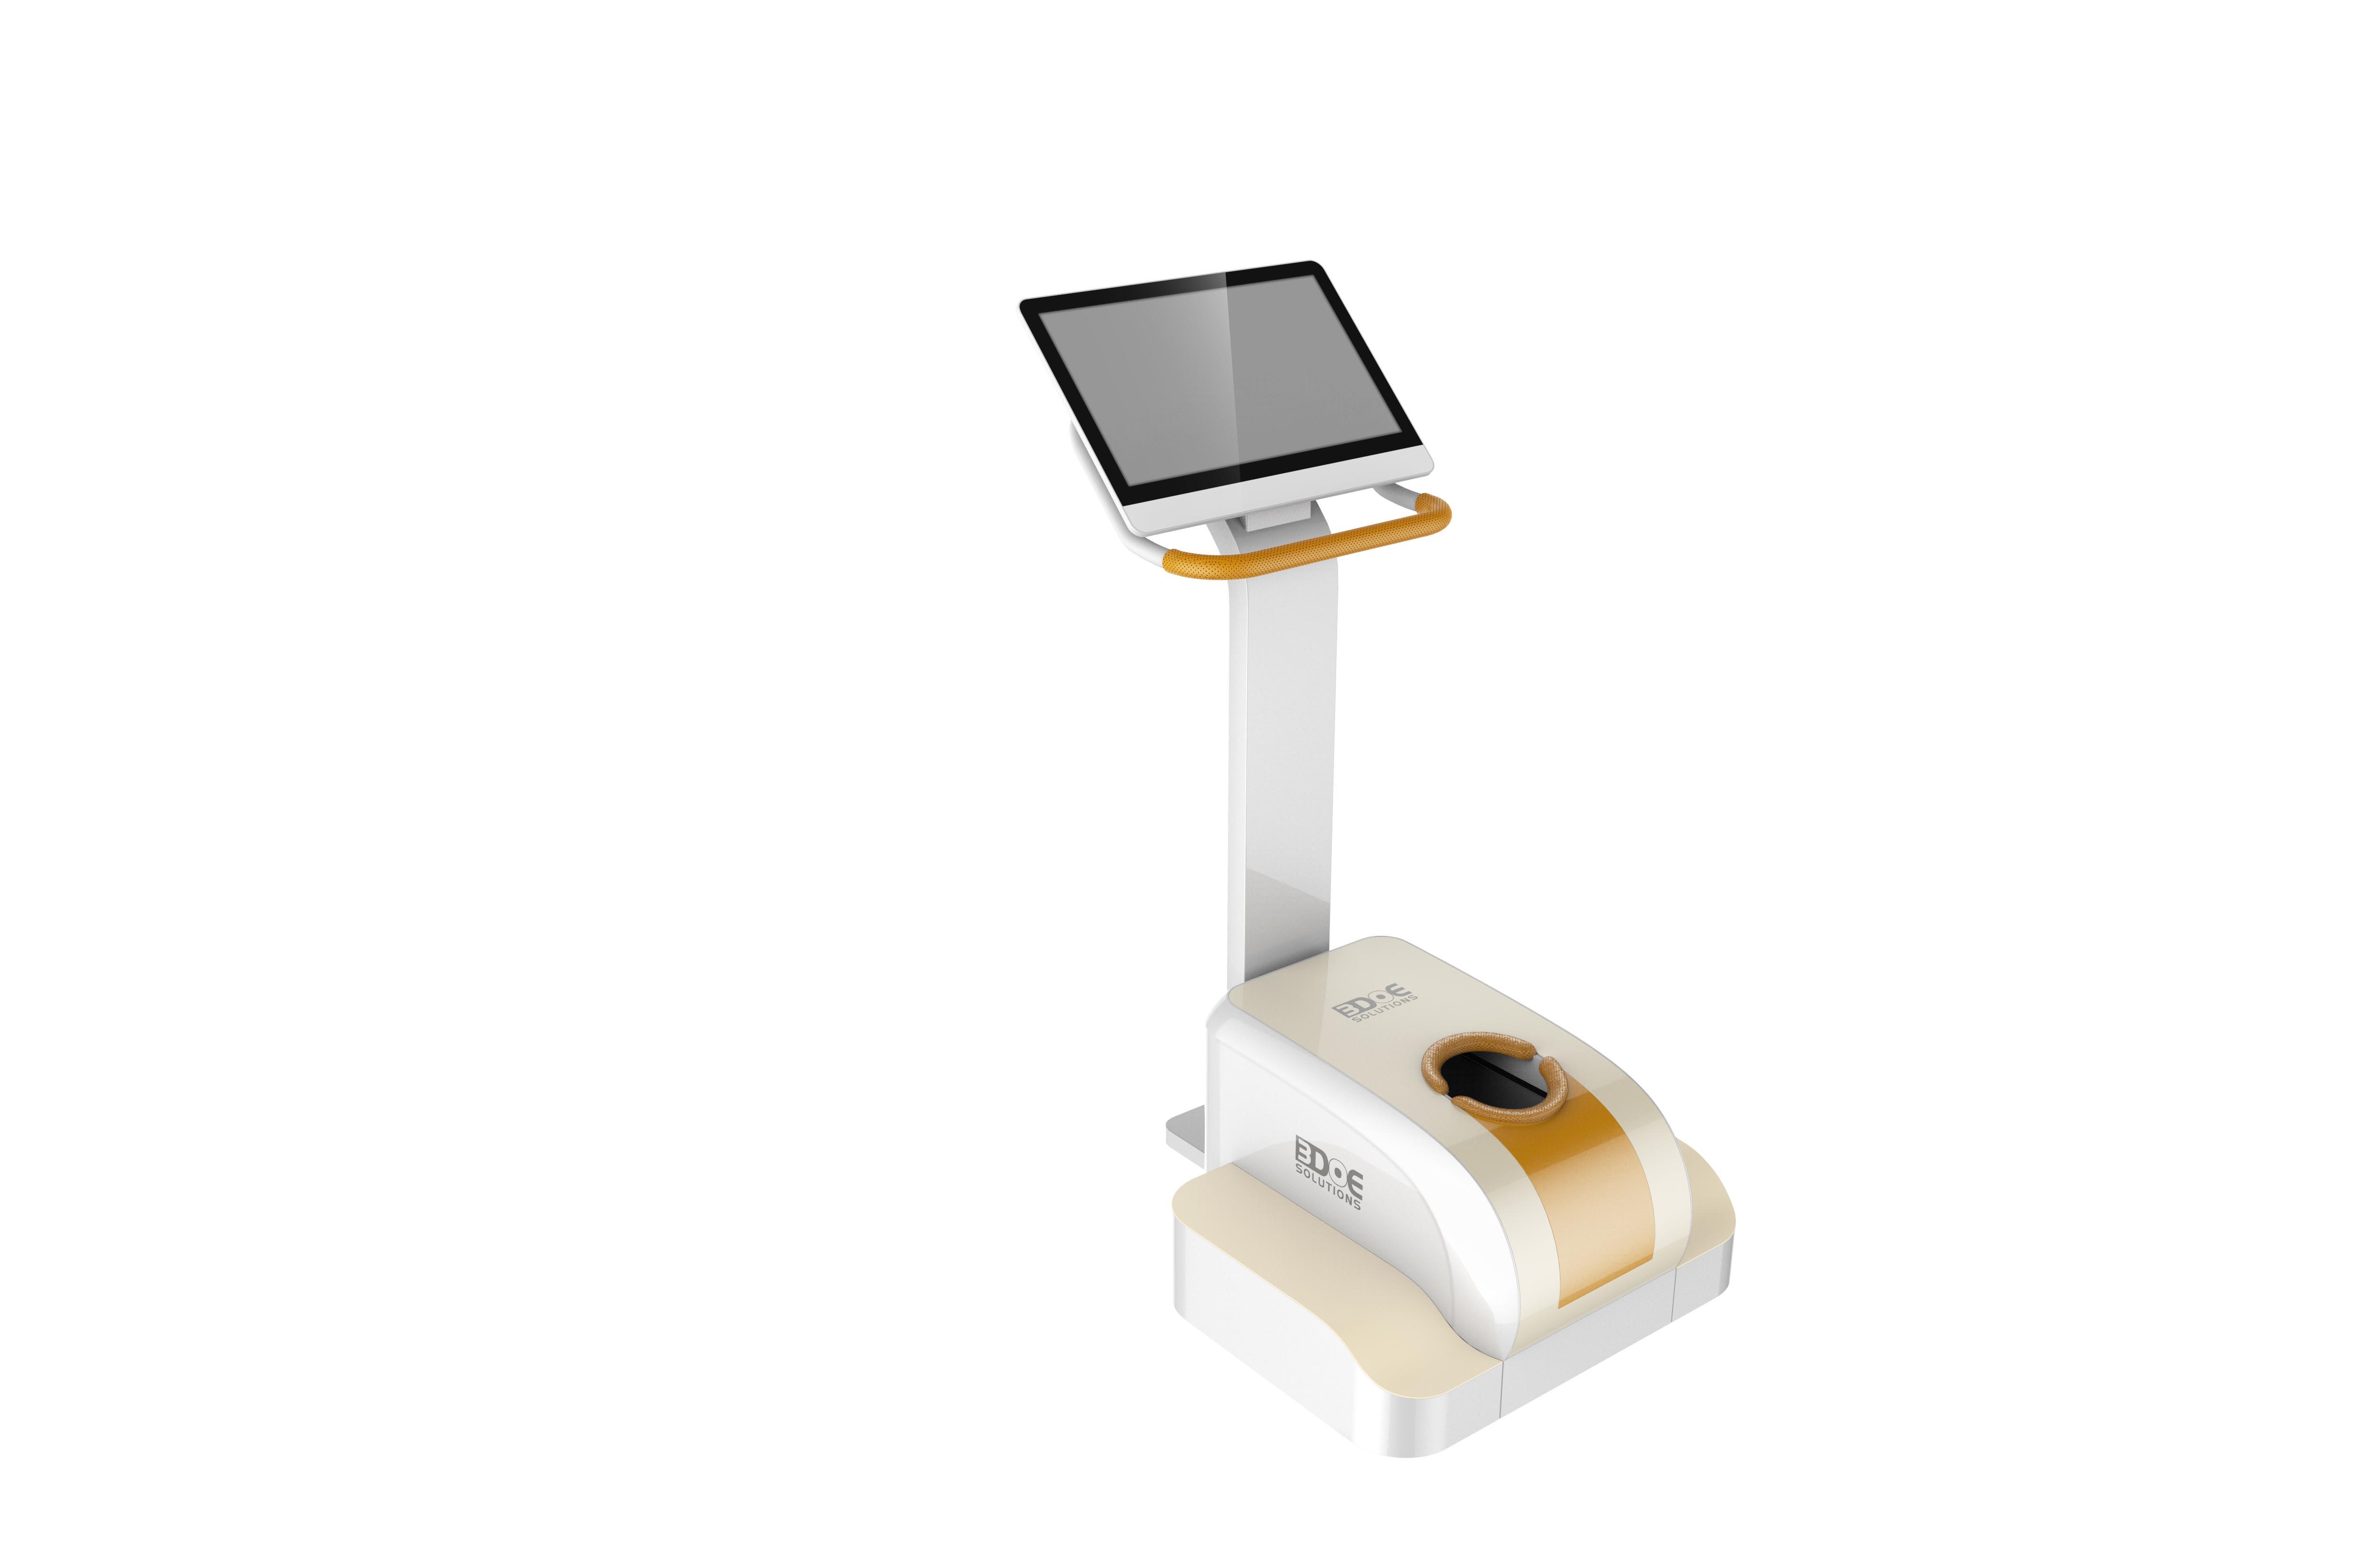 3D脚型数据扫描仪3_产品设计-来设计